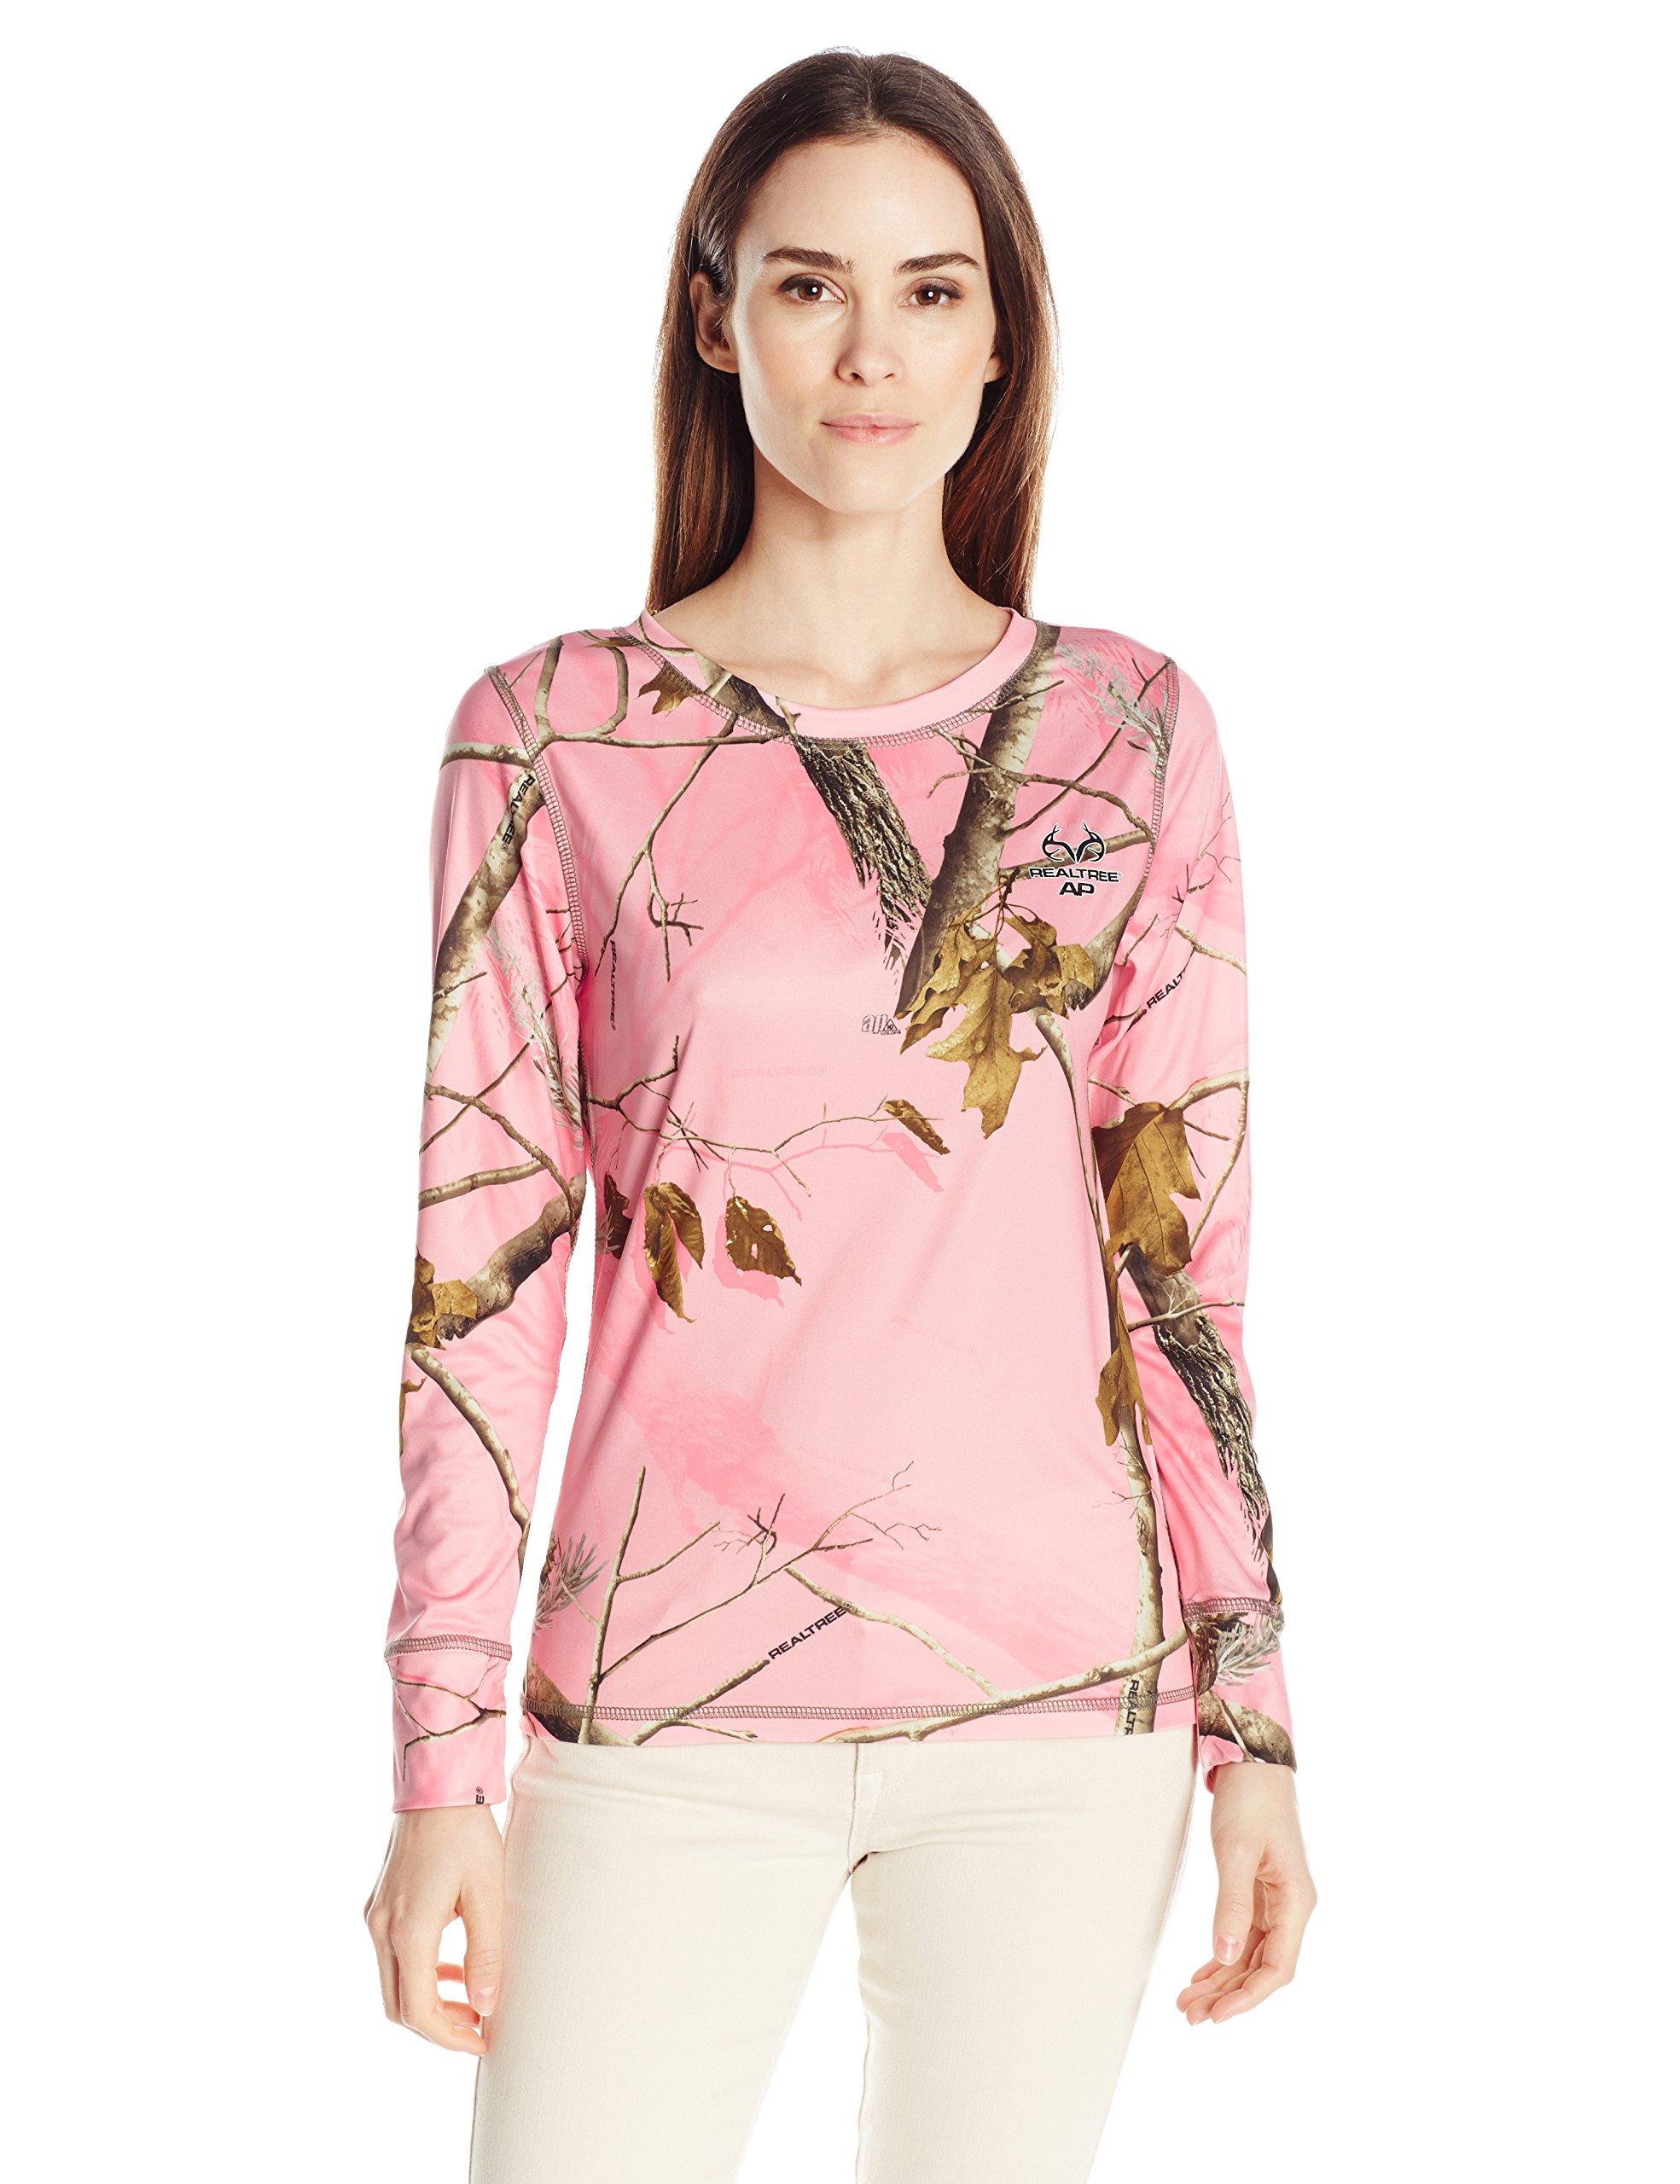 Realtree Women's Interlock Baselayer Thermal Top, Pink, Small